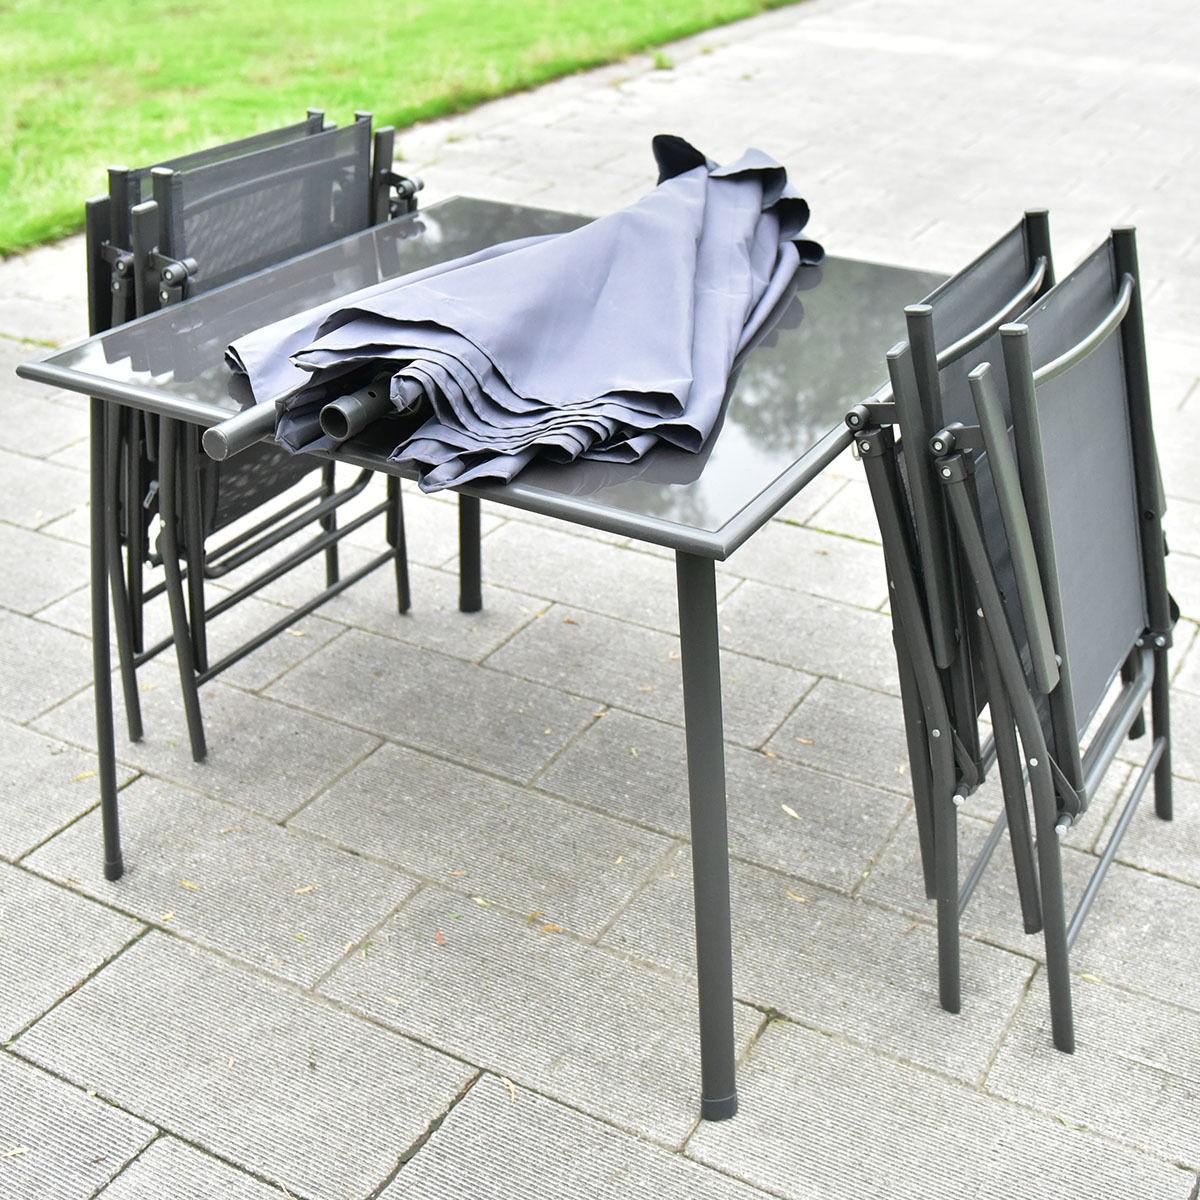 Gray 6pcs patio garden set furniture 4 folding chairs table with umbrella ebay - Garden table with umbrella ...